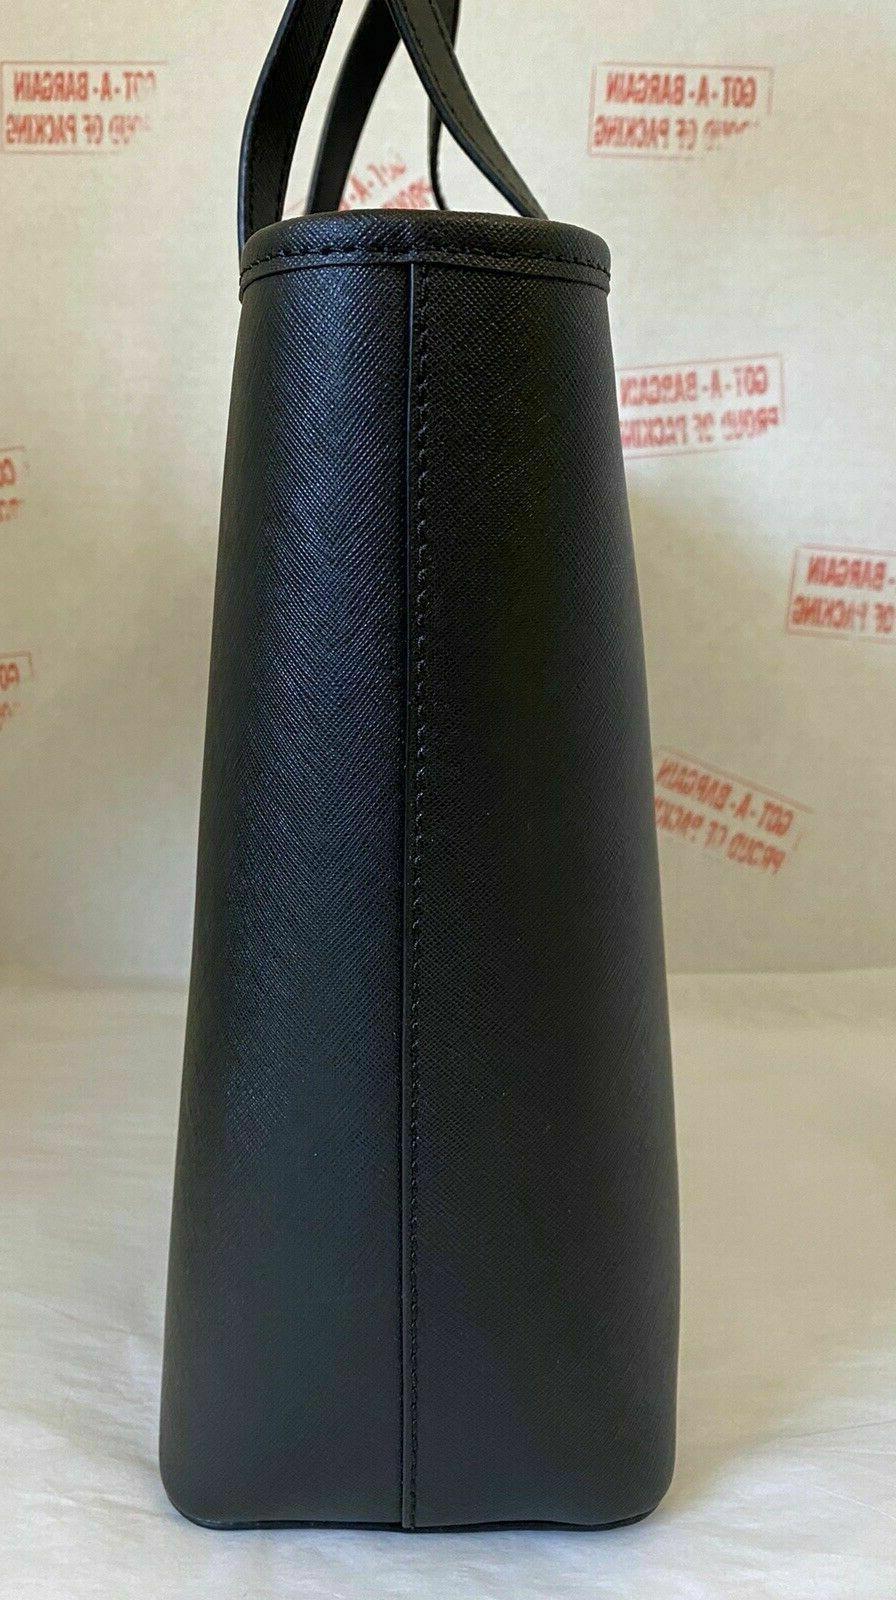 Michael Set Travel Leather/Signature Zip Tote